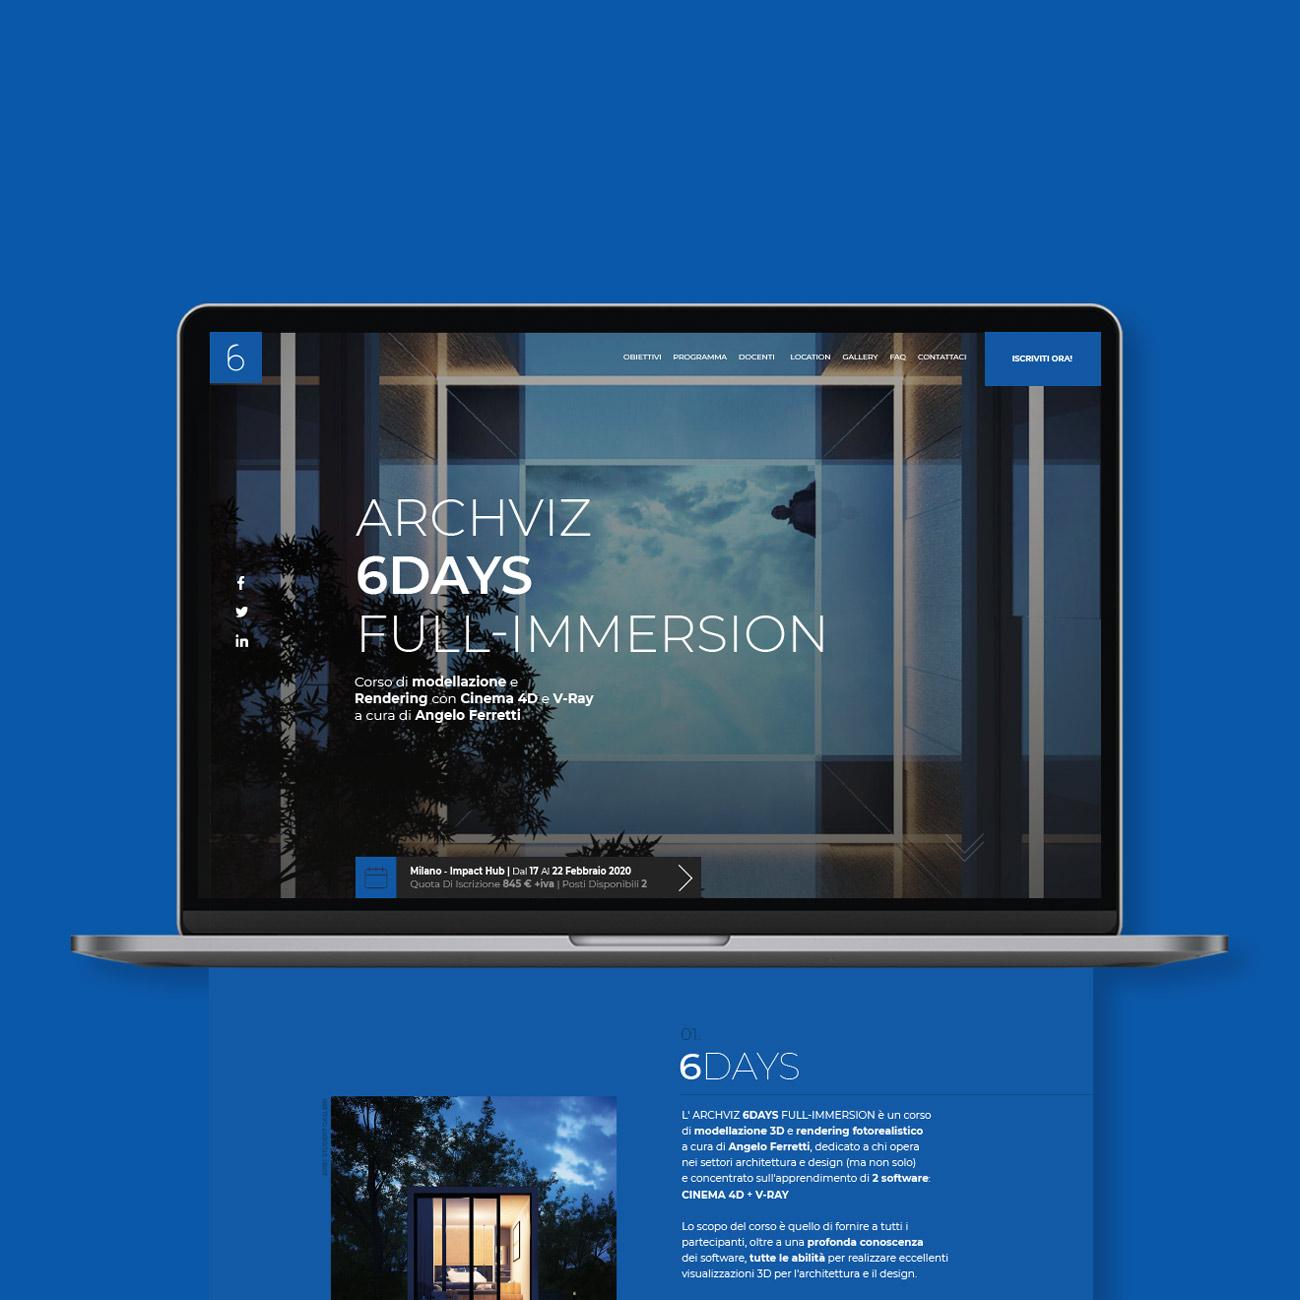 Archviz 6DAYS Full-immersion web design labbestia